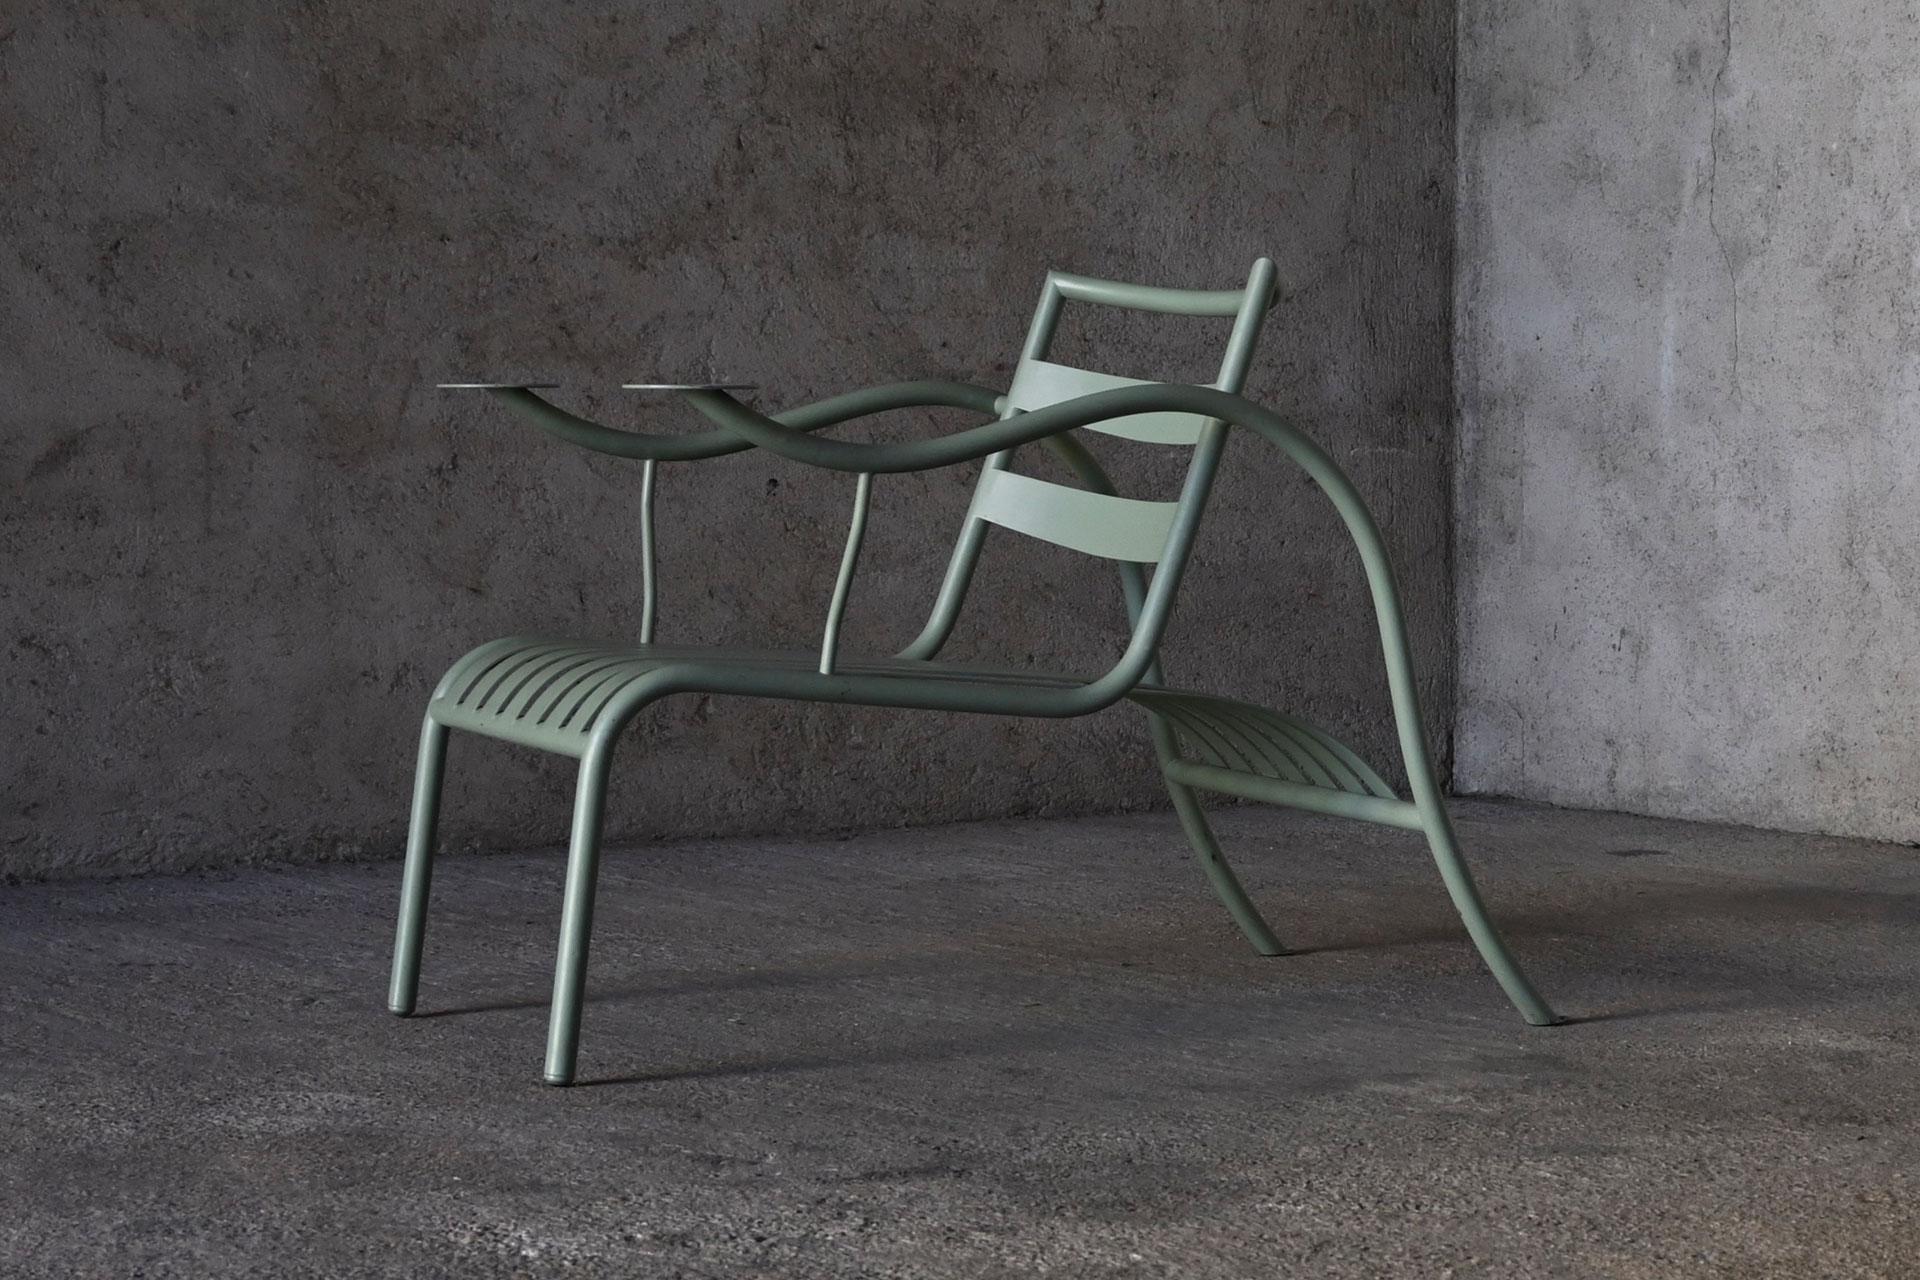 Cappellini Jasper Morrison Thinking Man's Chair 1988